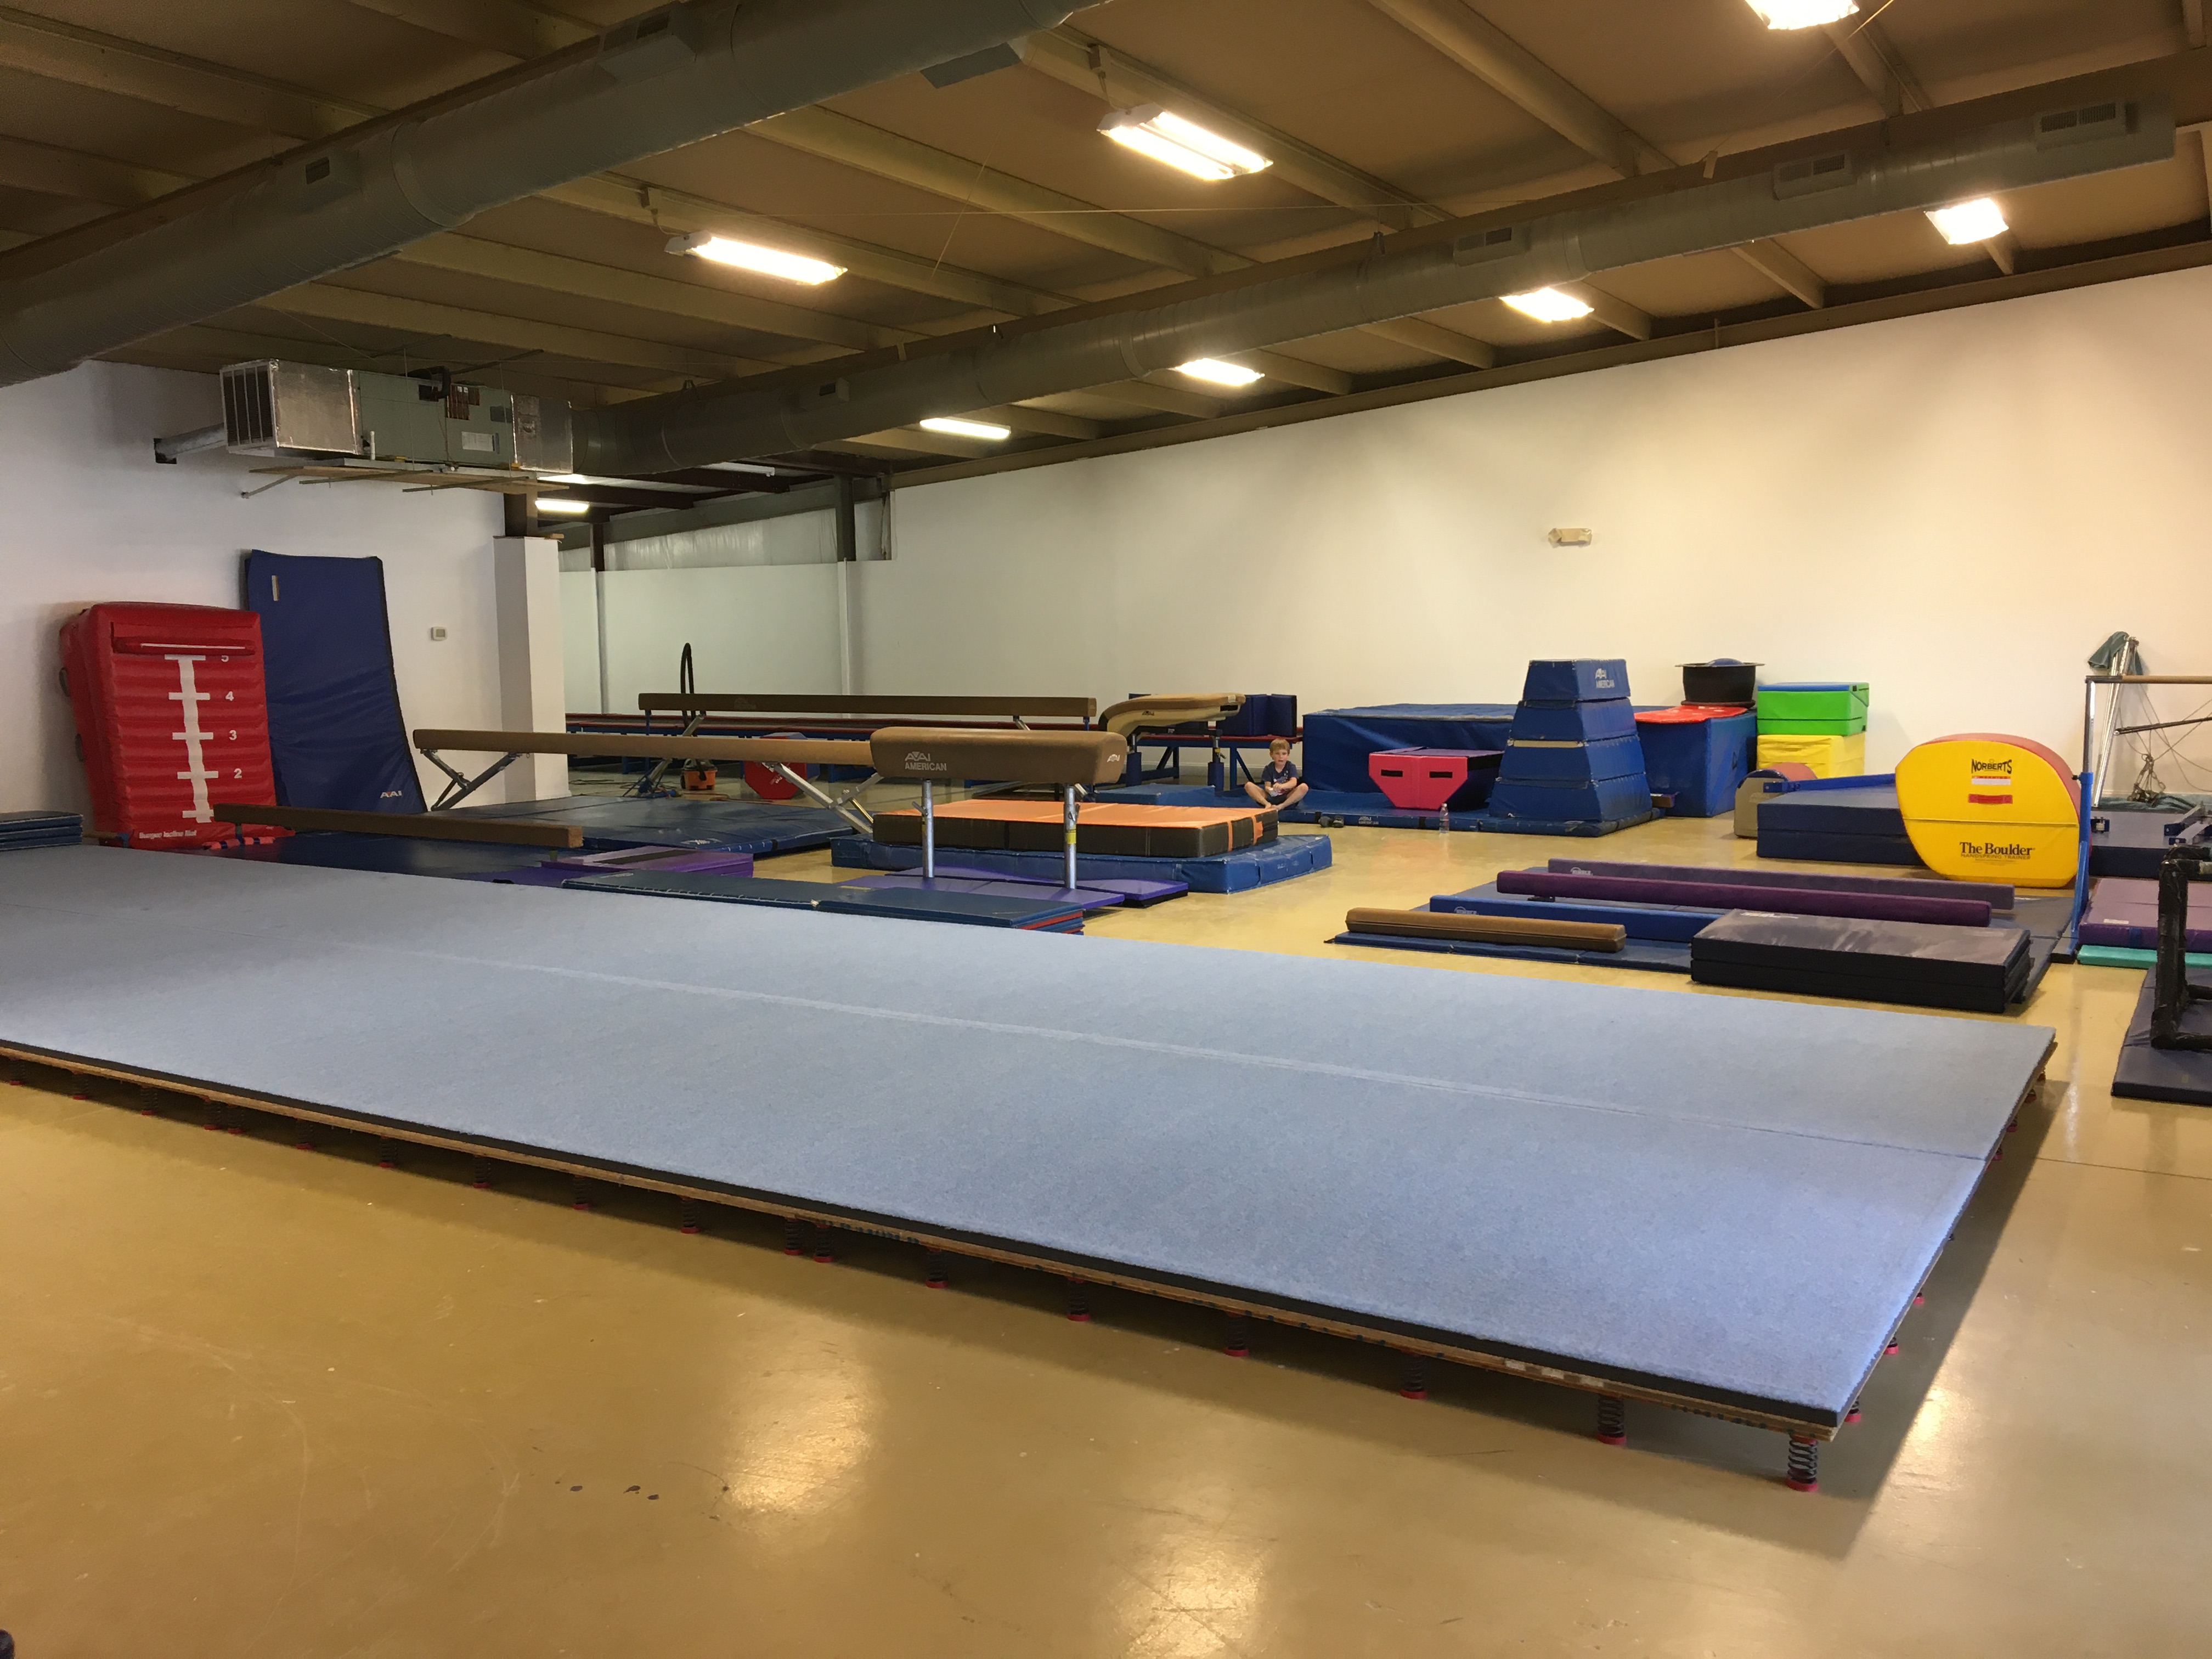 New Big Gym in Progress